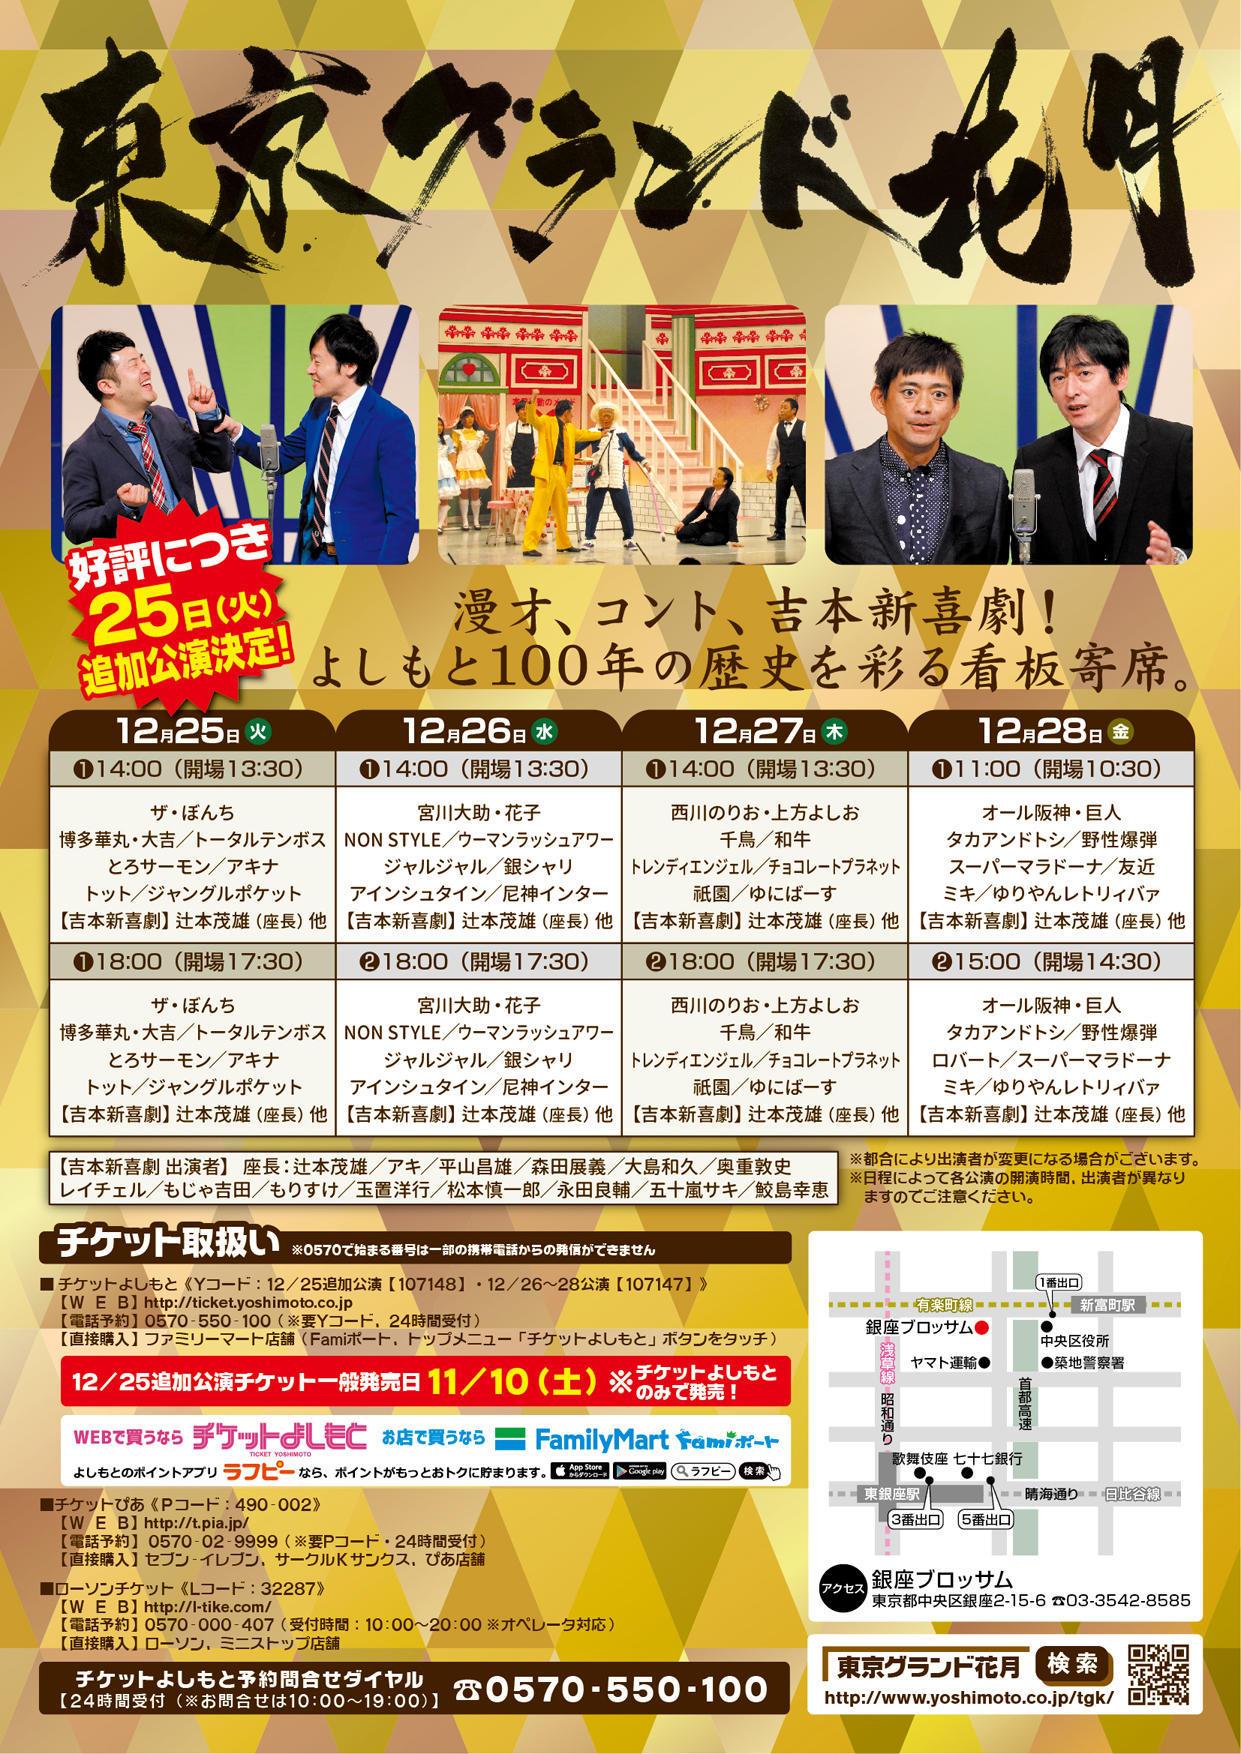 http://news.yoshimoto.co.jp/20181102152413-9ac62100615cf751d6f90a73ac5cee302c085166.jpg